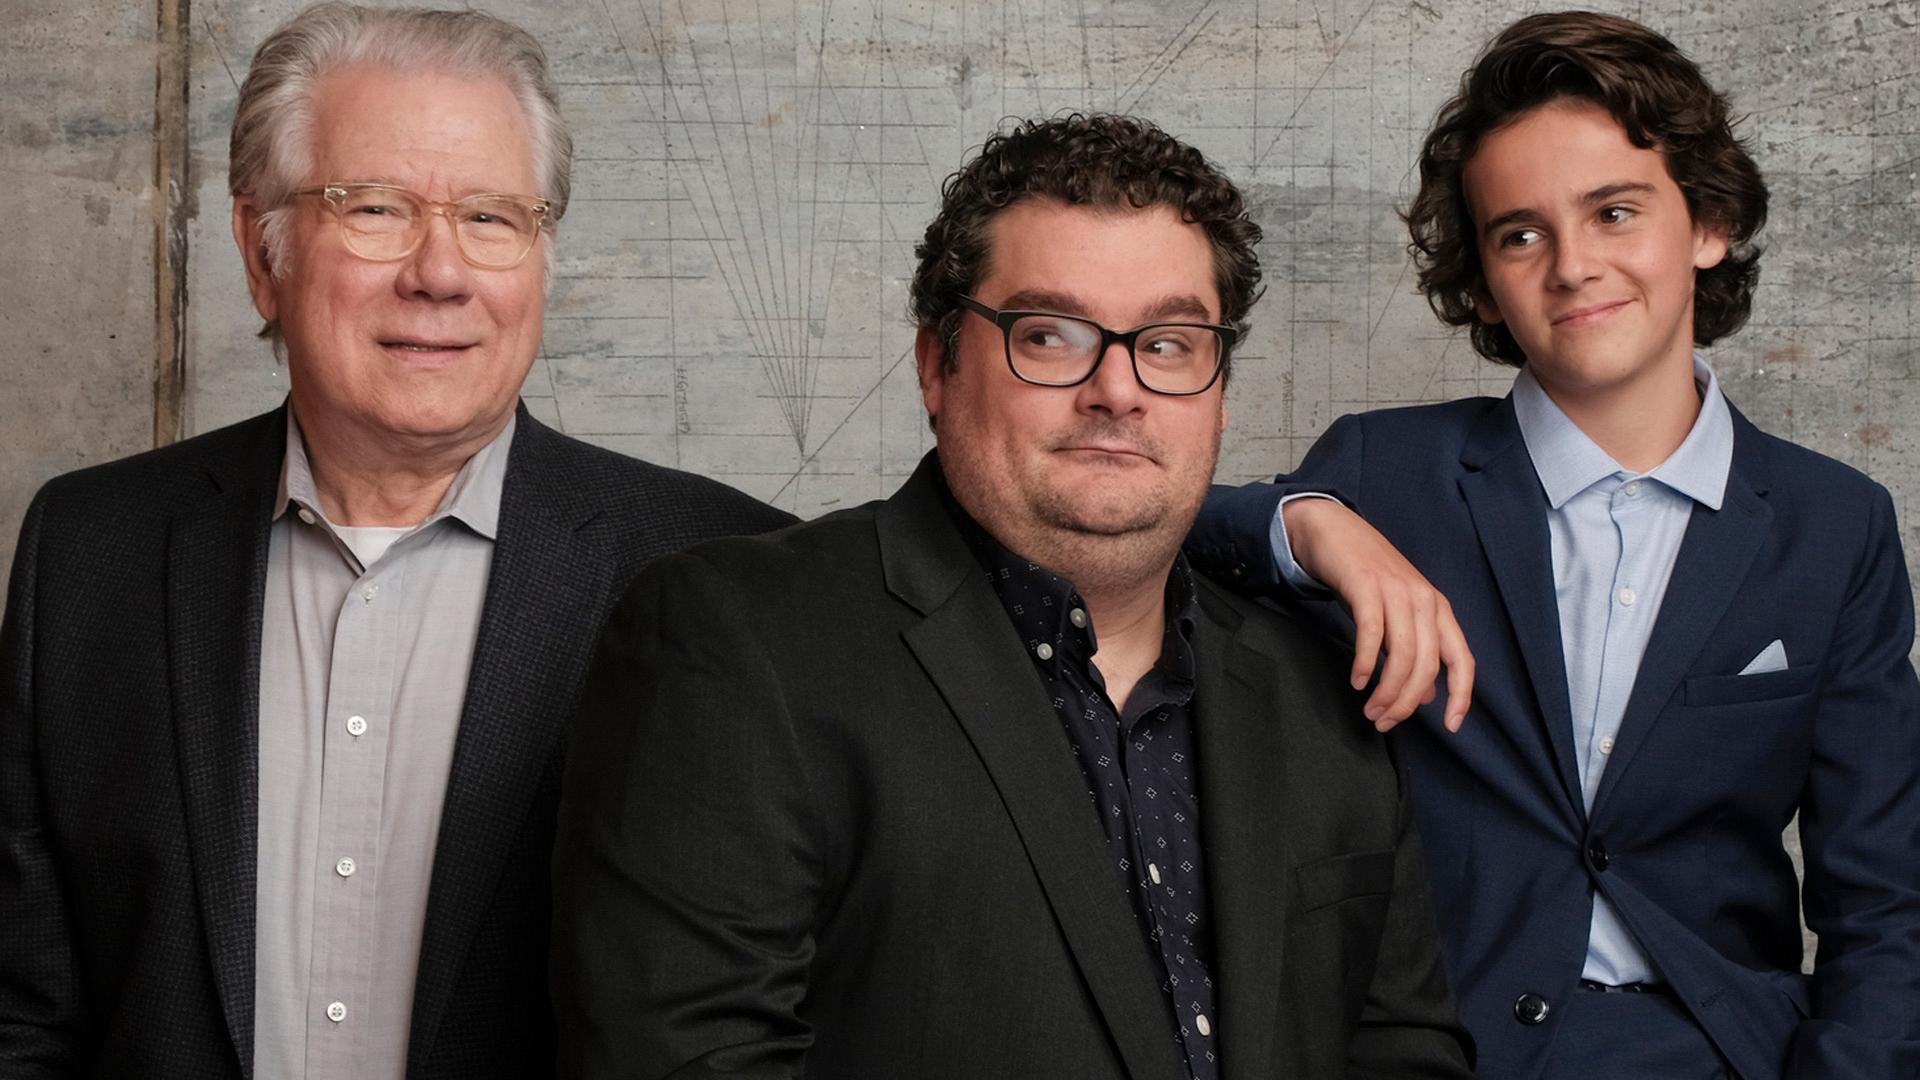 John Larroquette, Bobby Moynihan, and Jack Dylan Grazer of Me, Myself & I